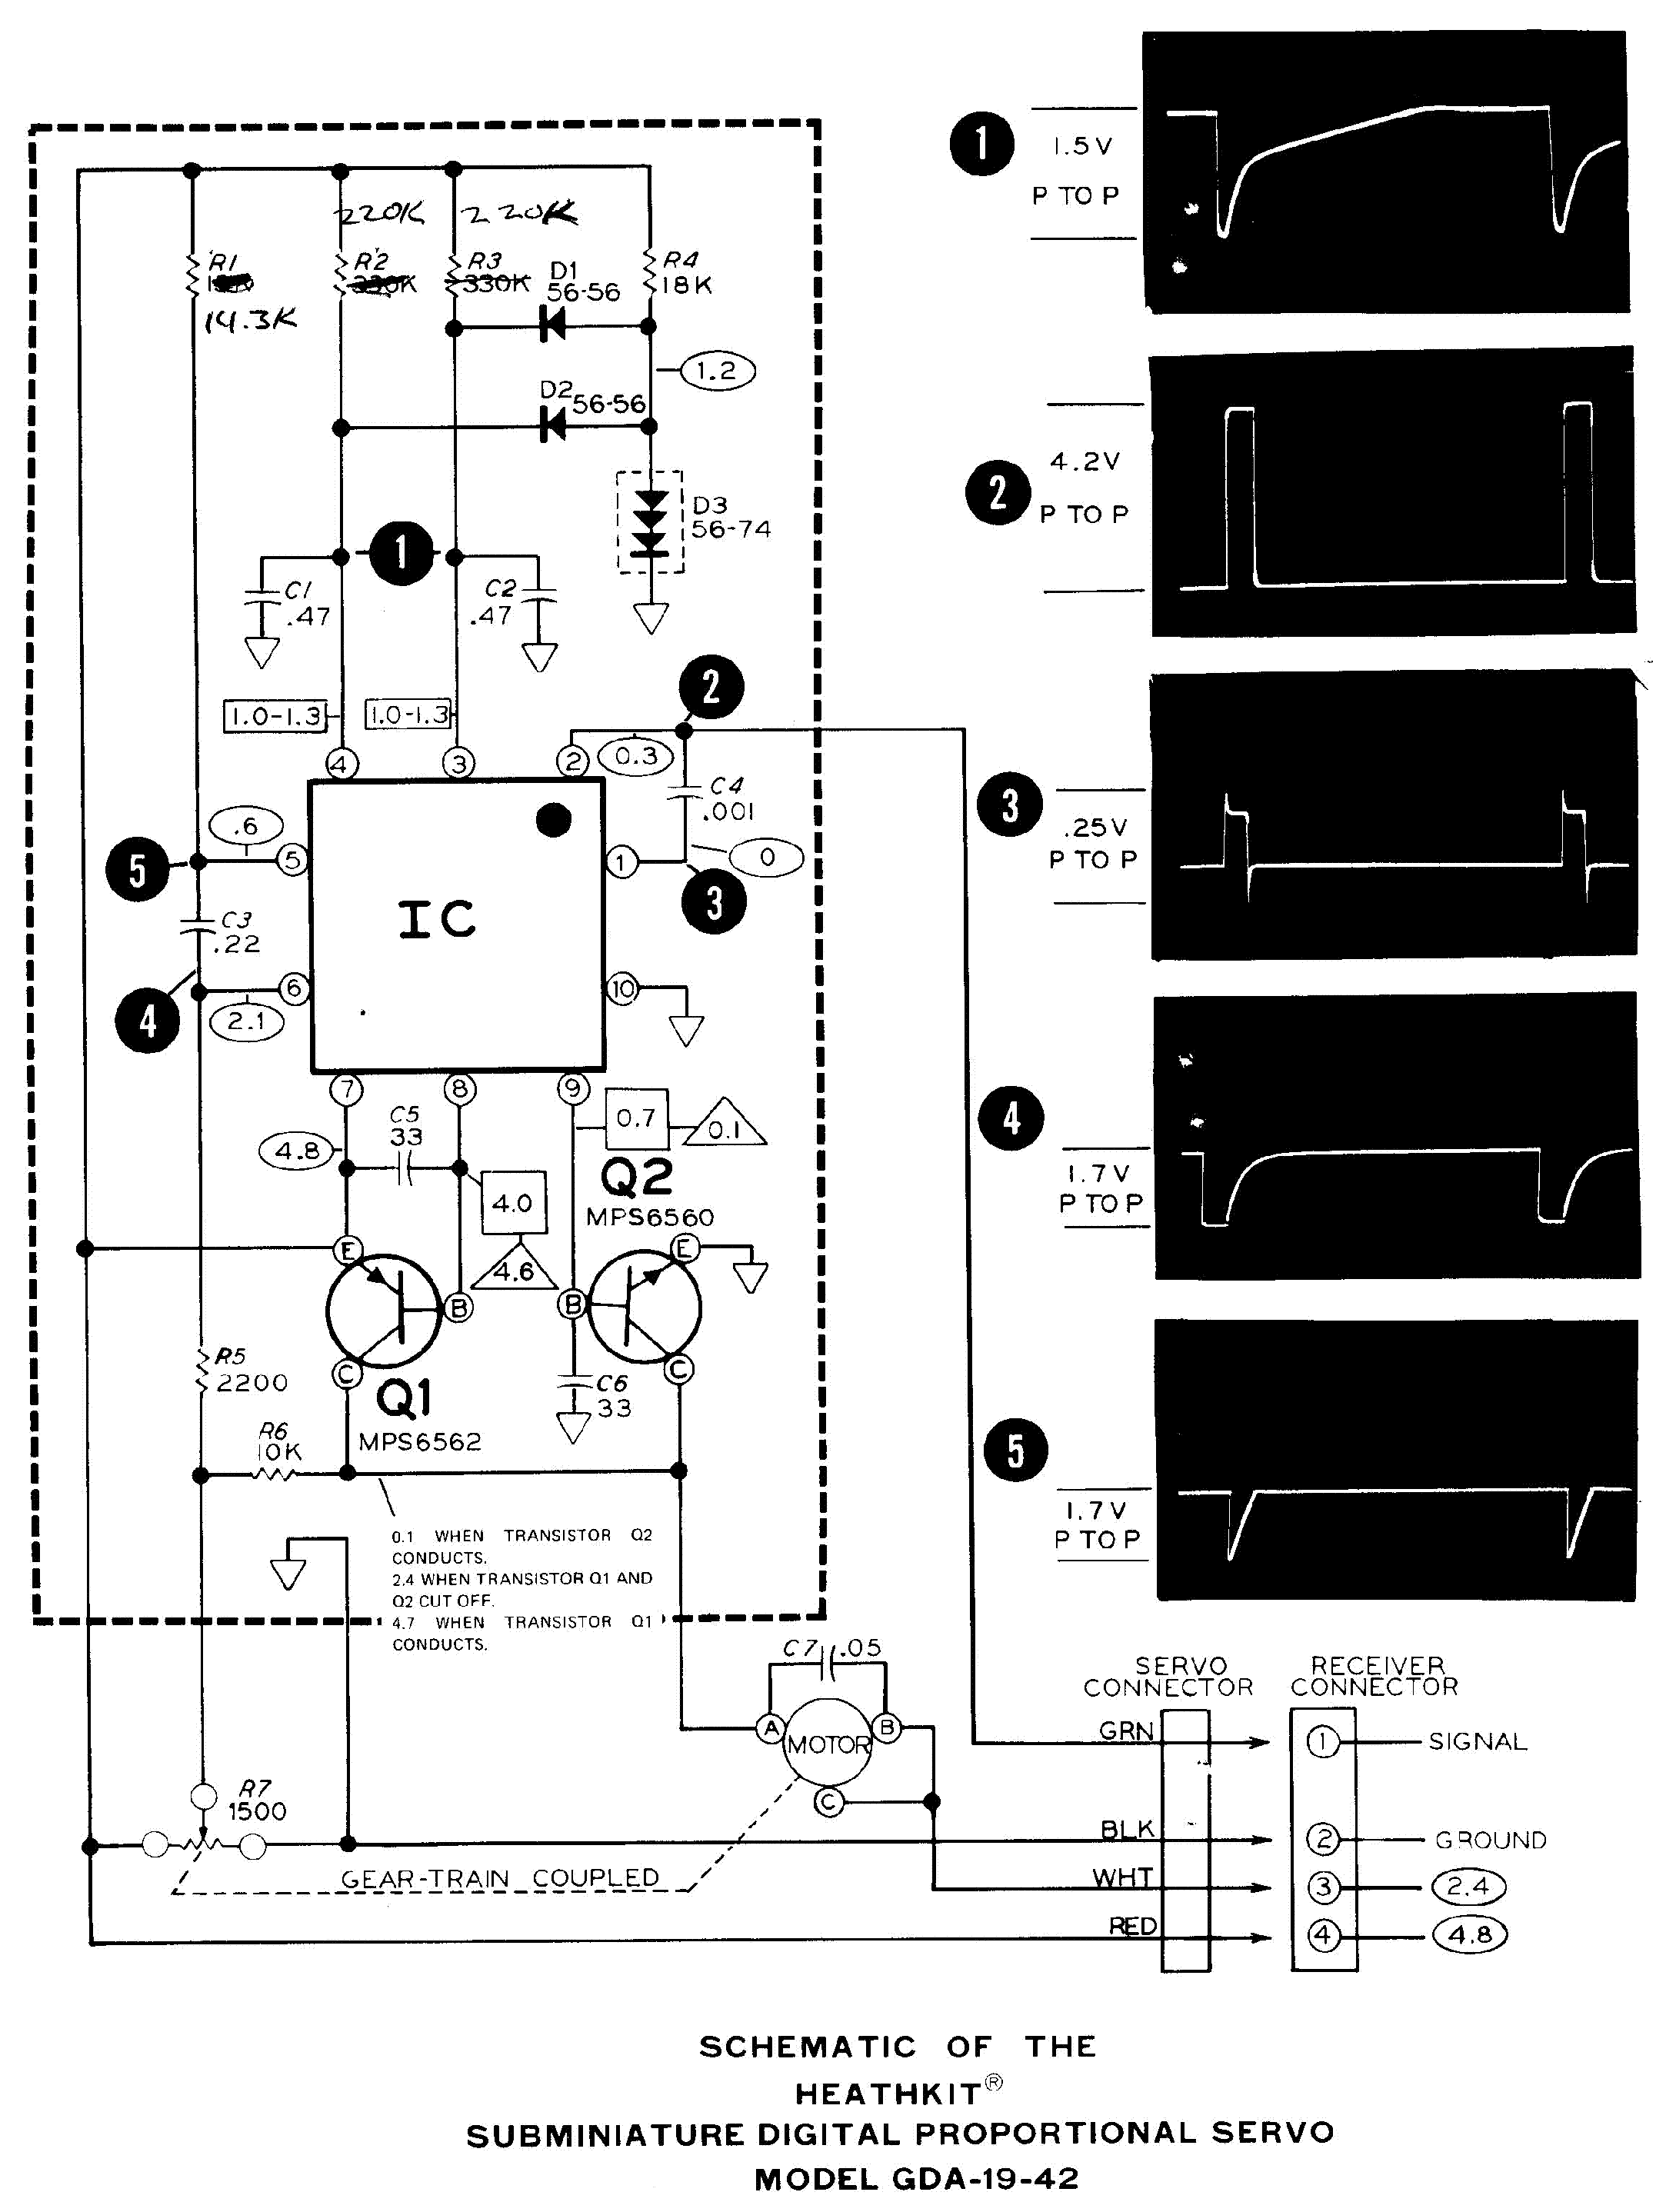 Am Digital proportional transmitter manual